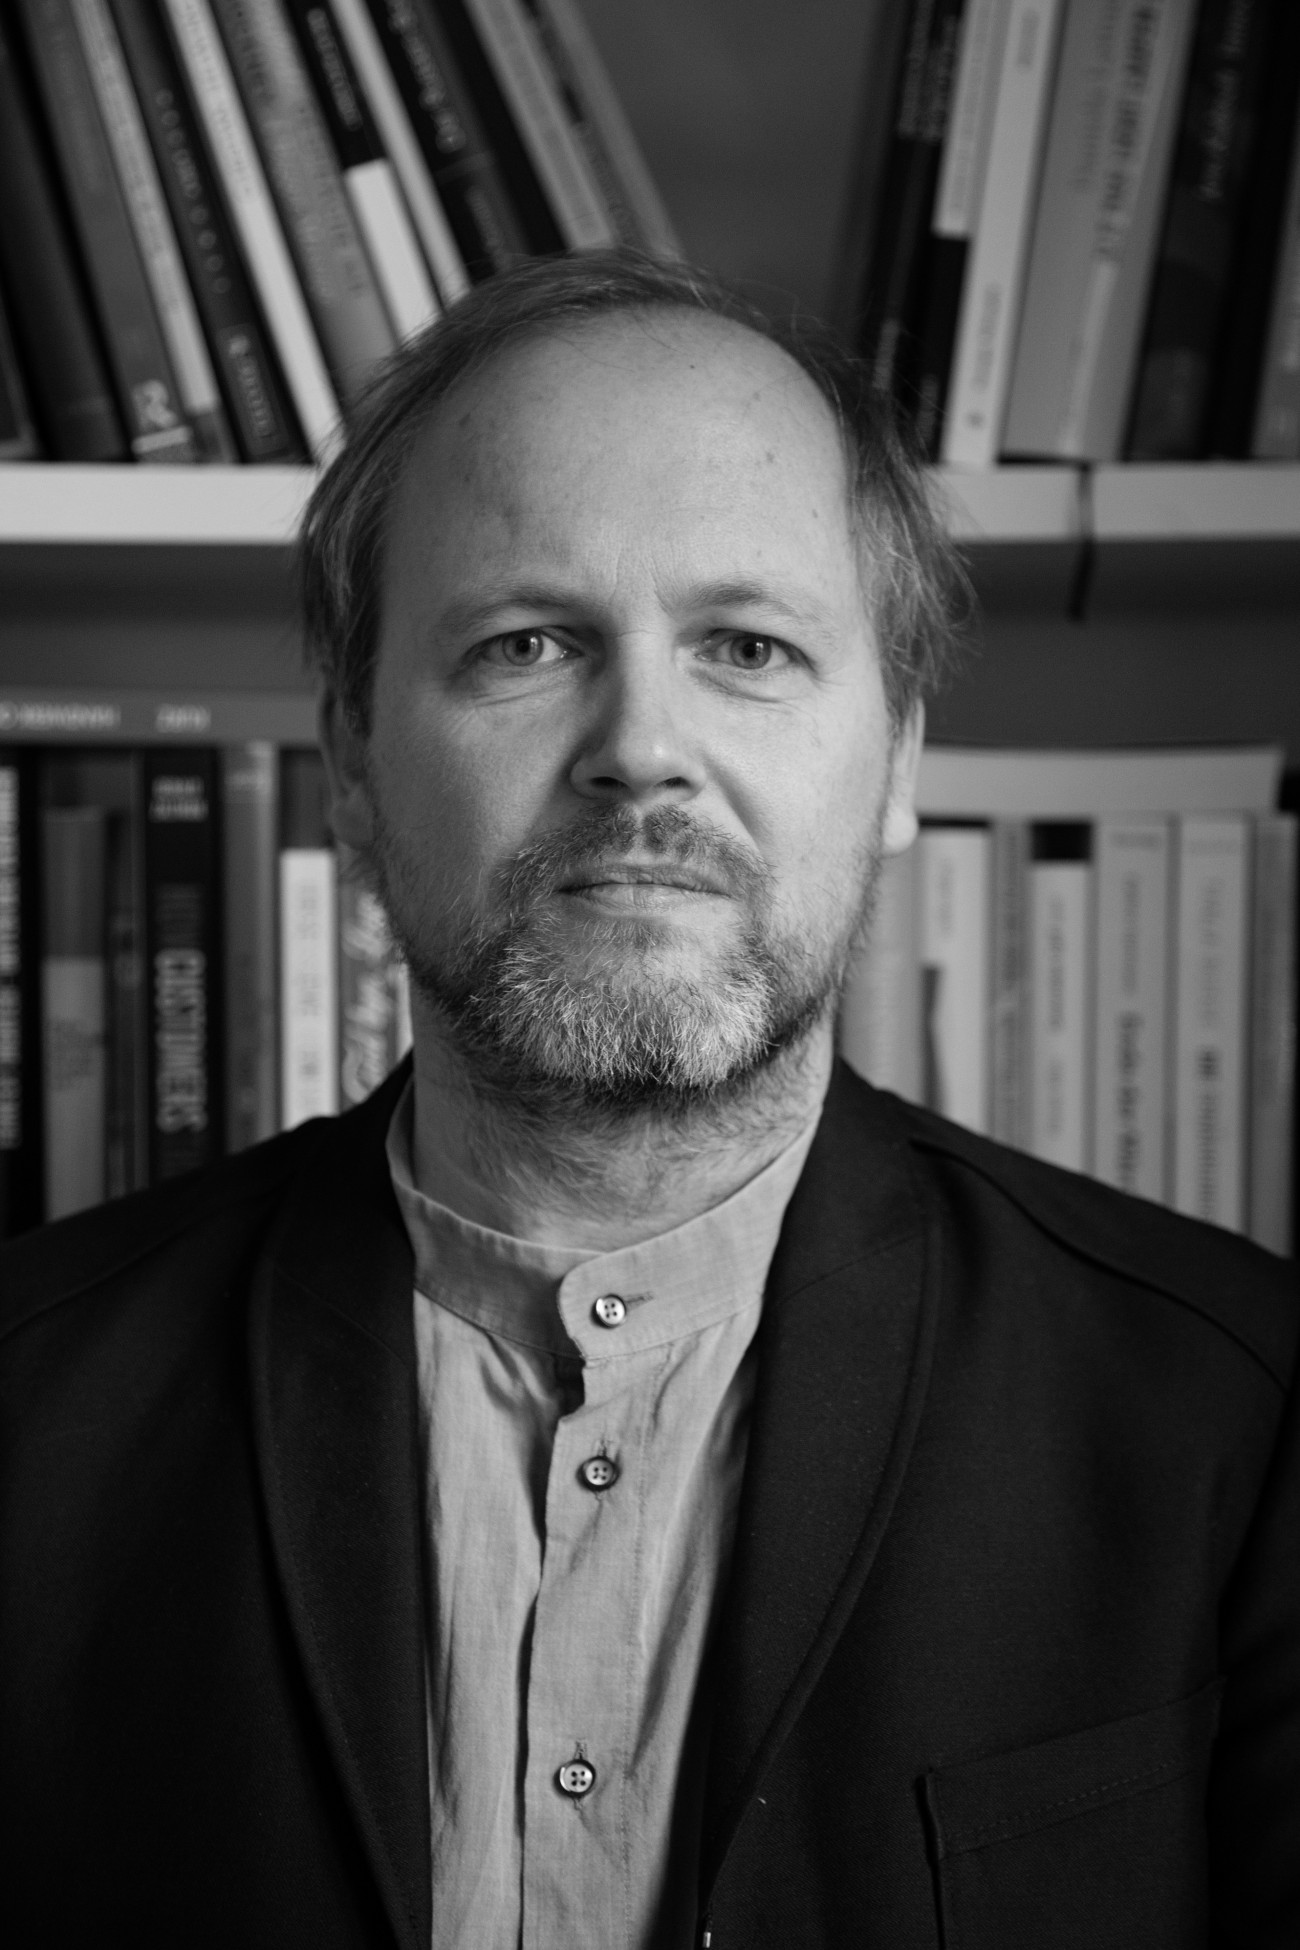 Wolfgang Ullrich, fotografiert von Annekathrin Kohout